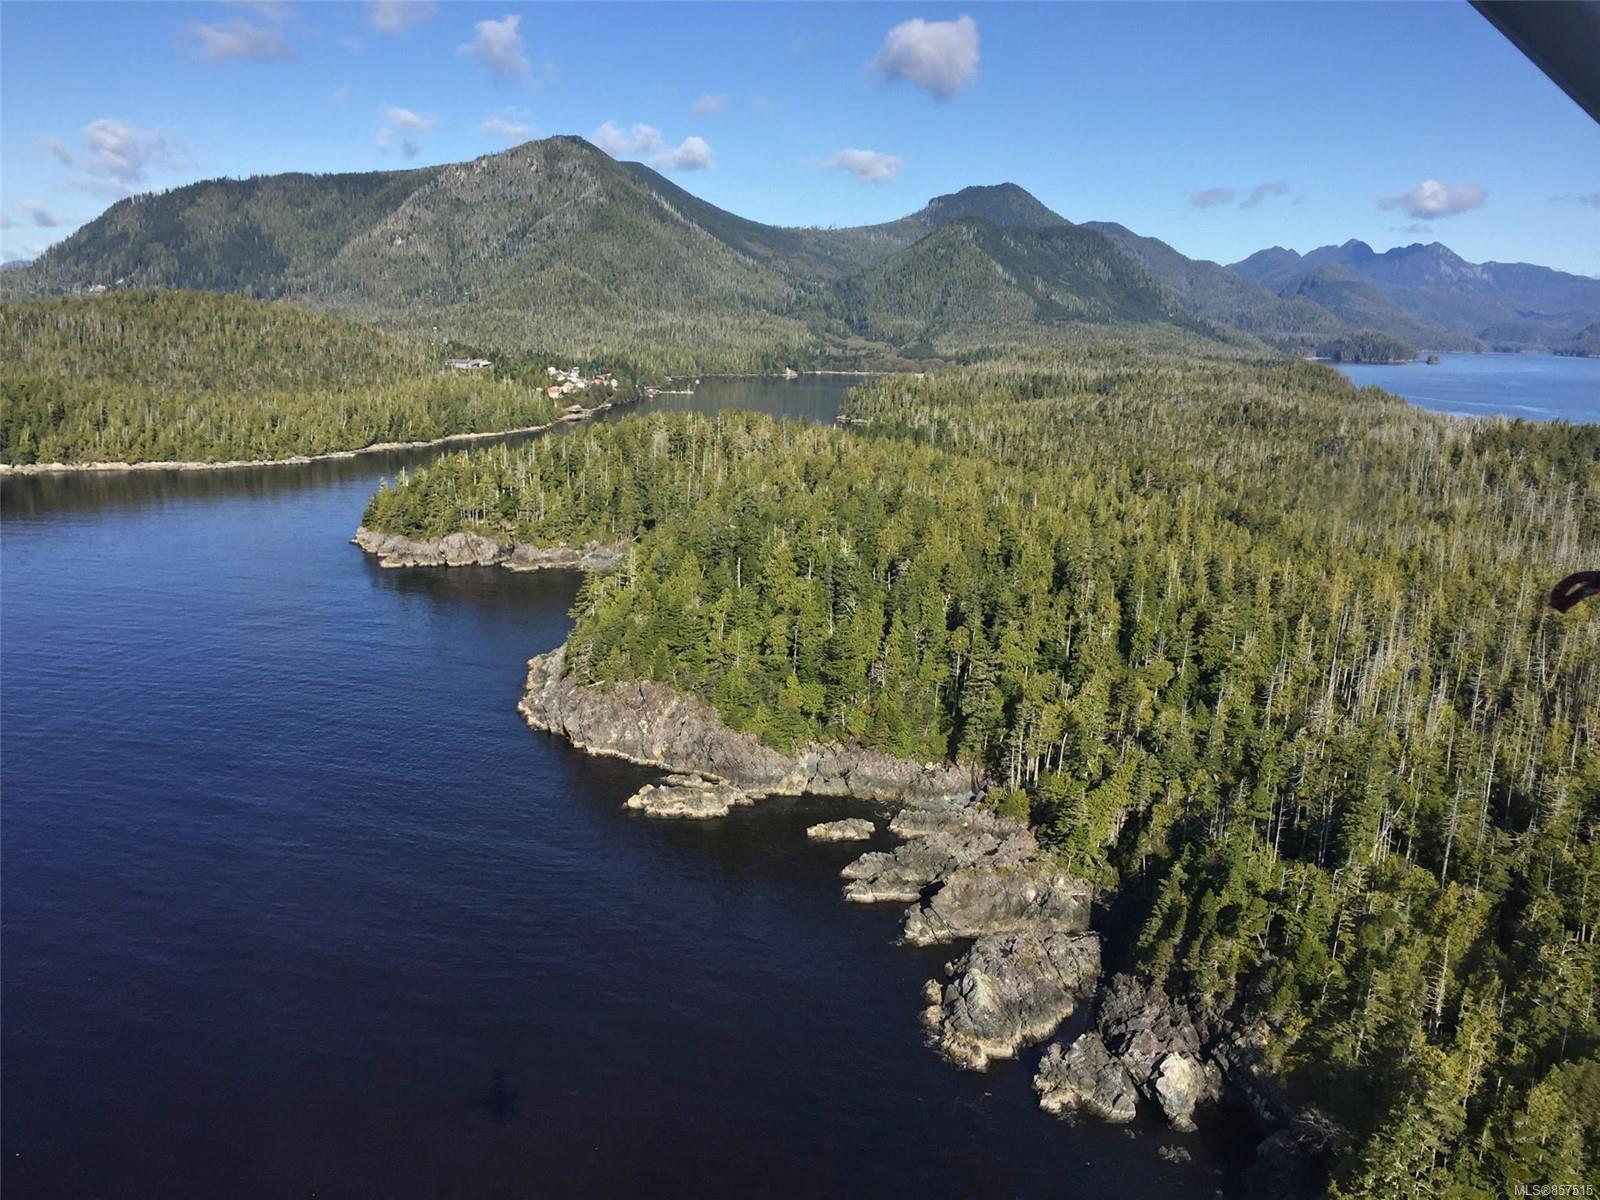 Main Photo: SL 37 Hot Springs Oceanside in : PA Tofino Land for sale (Port Alberni)  : MLS®# 857515